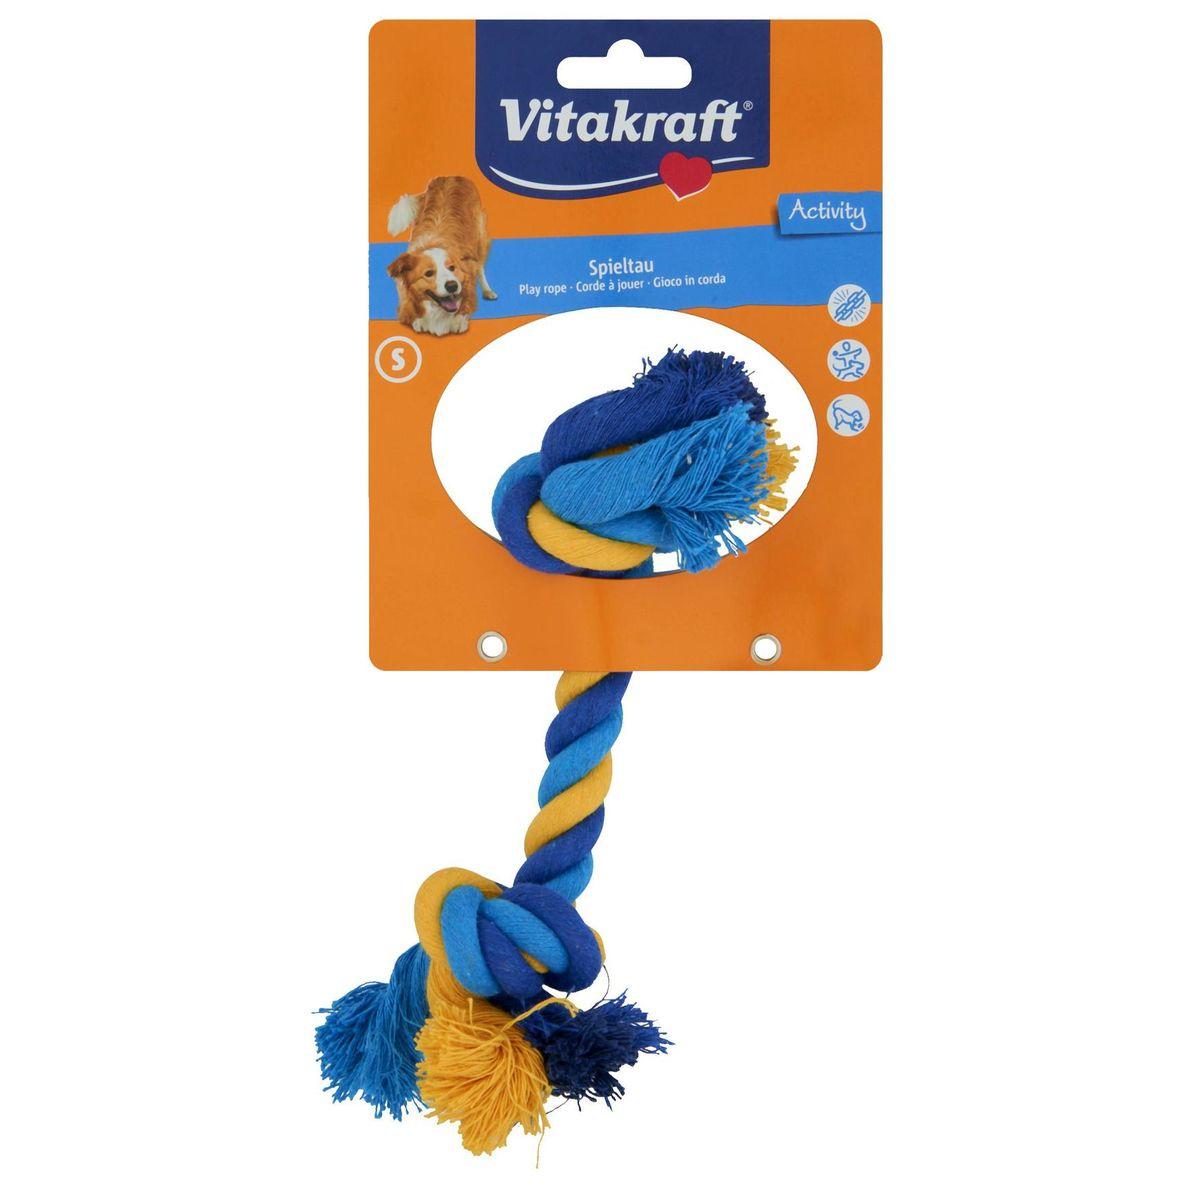 Vitakraft Activity Play Rope S